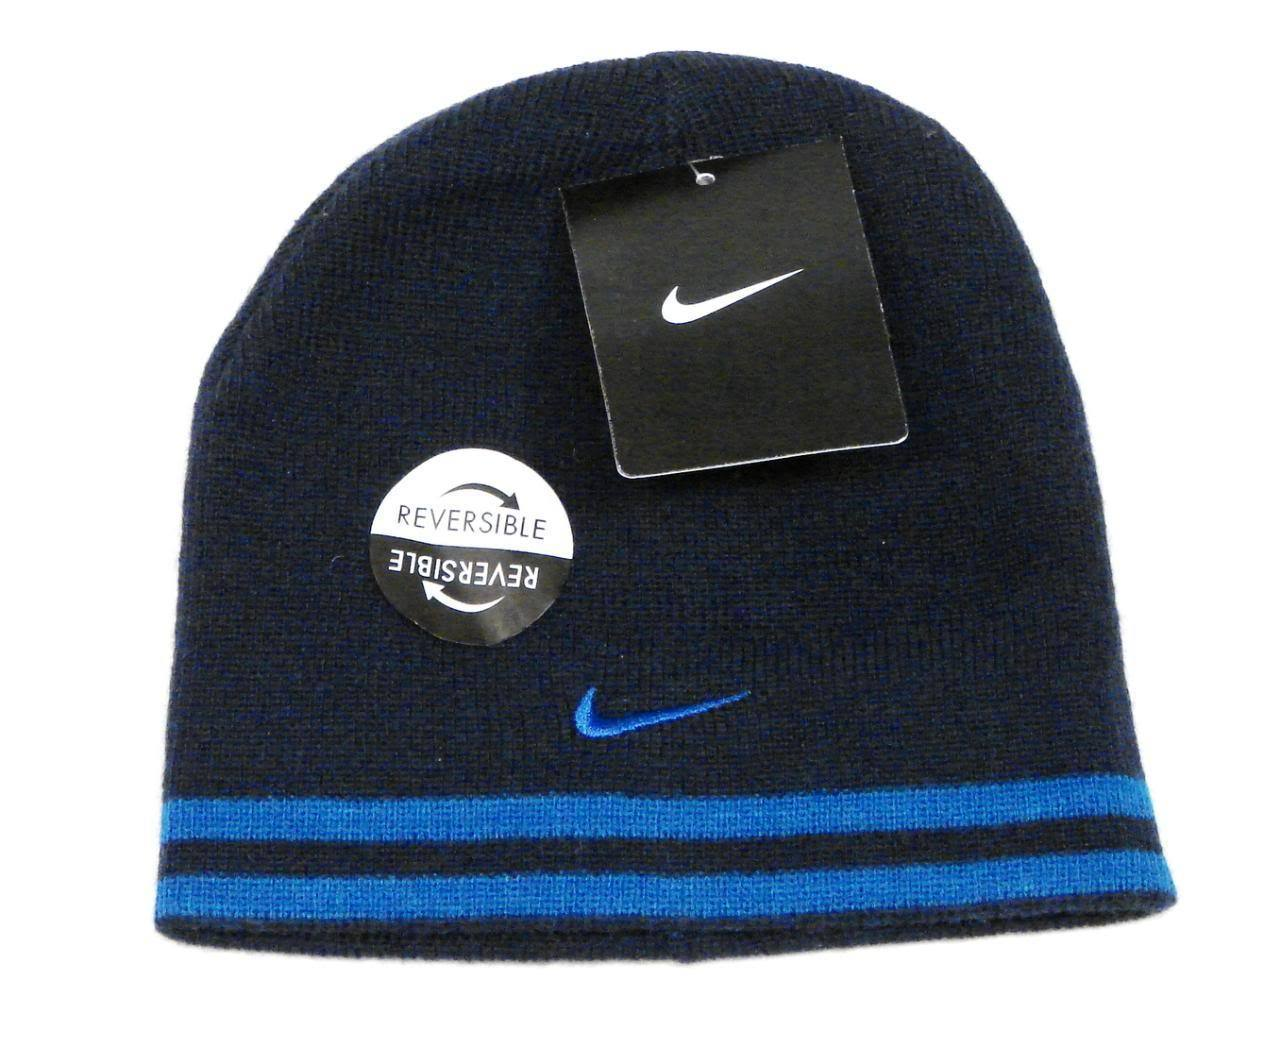 Nike Reversible Navy Blue   Royal Blue Knit and 50 similar items. S l1600 8951fb62a2b4